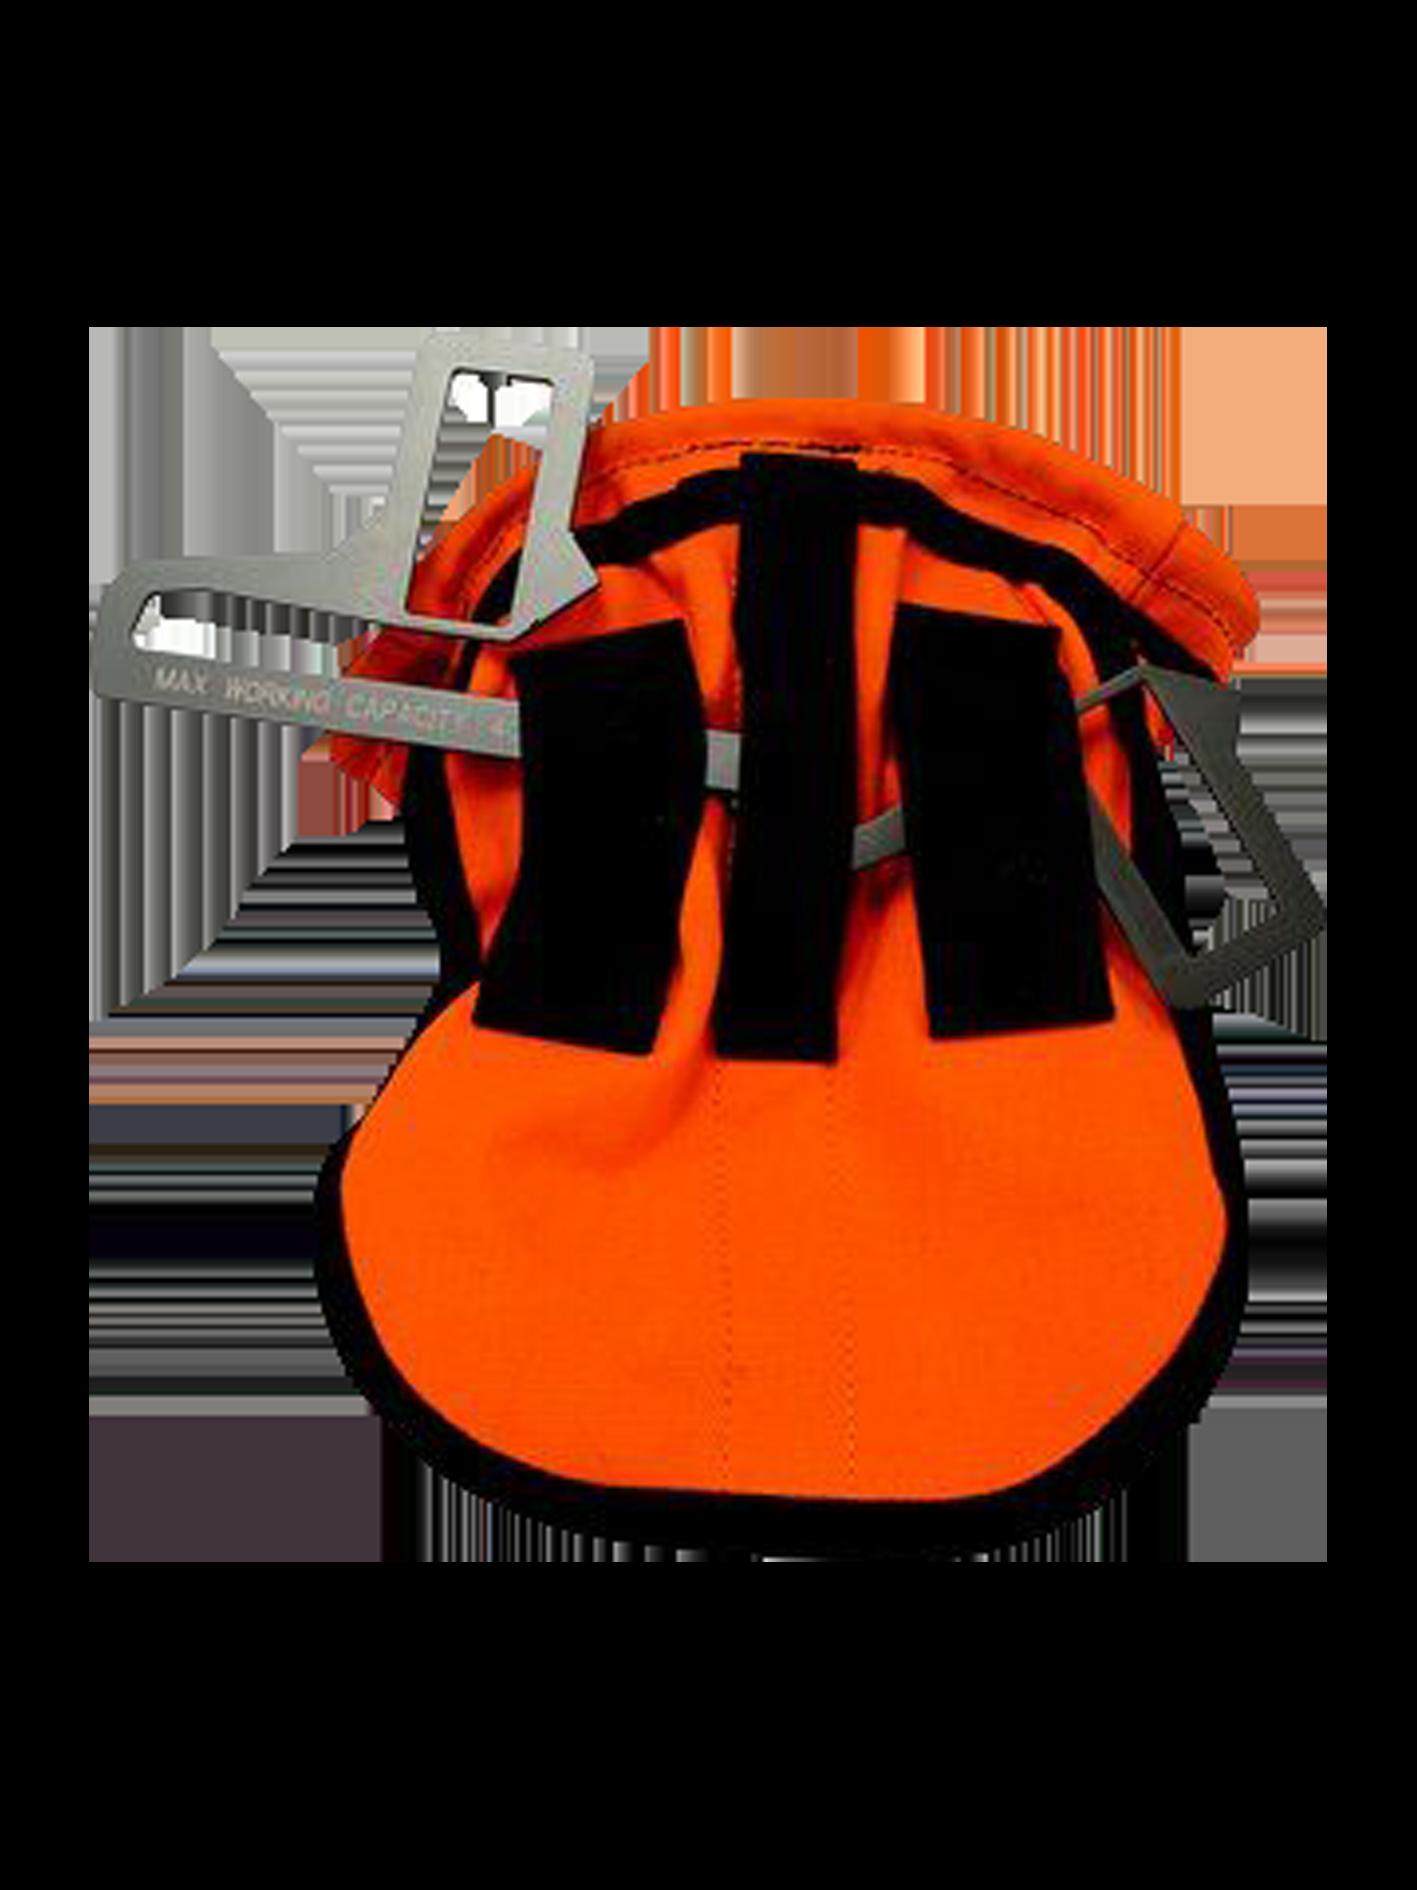 3M™ DBI-SALA® Tool Bag Hanger for 3M™ DBI-SALA® ExoFit STRATA™ Harness